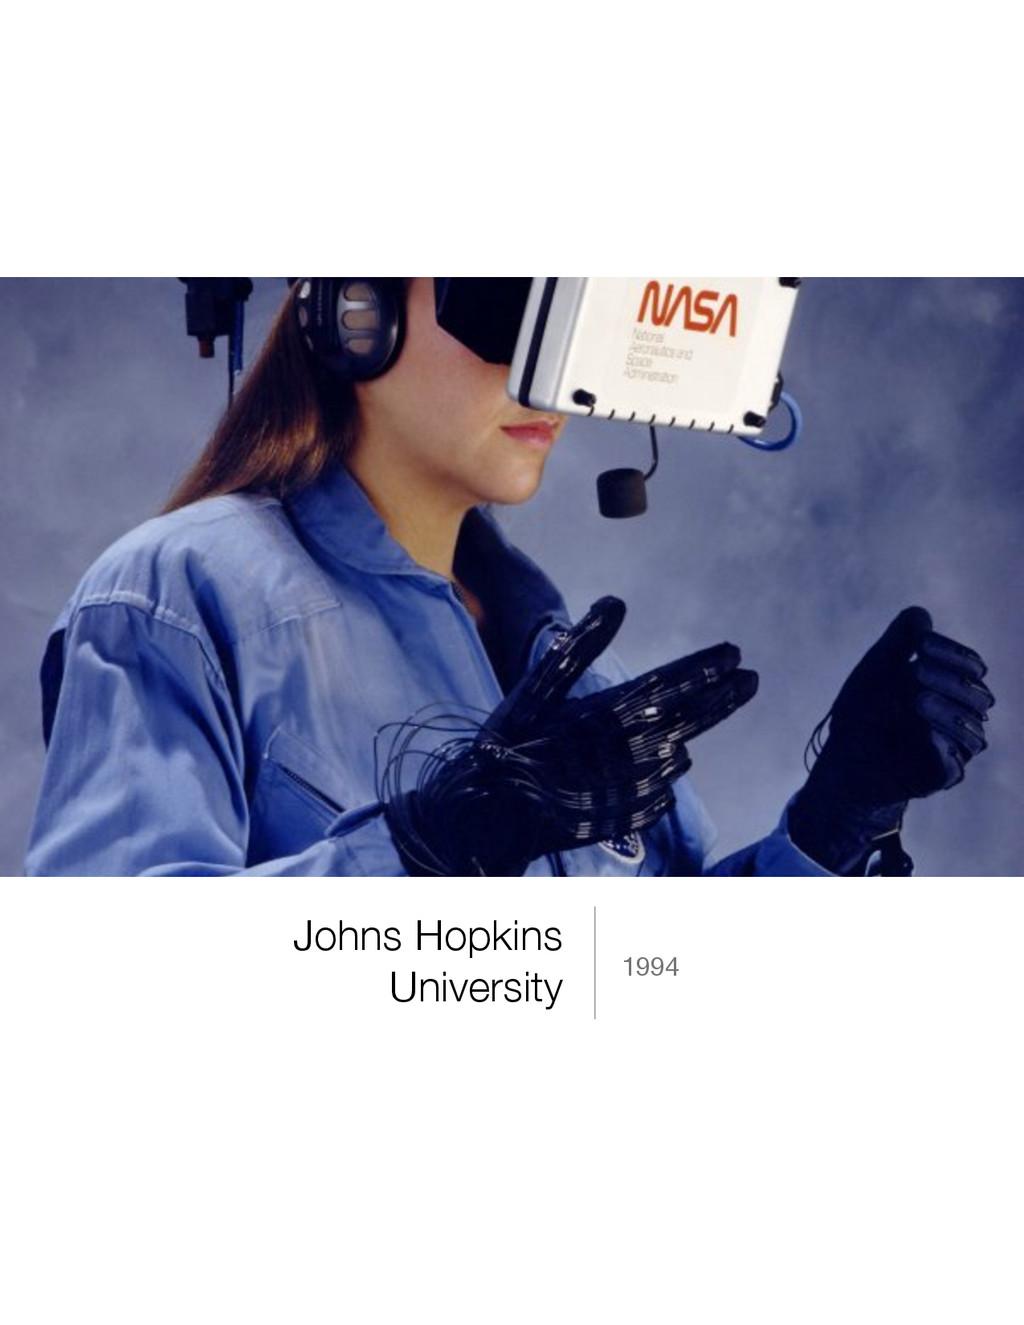 Johns Hopkins University 1994